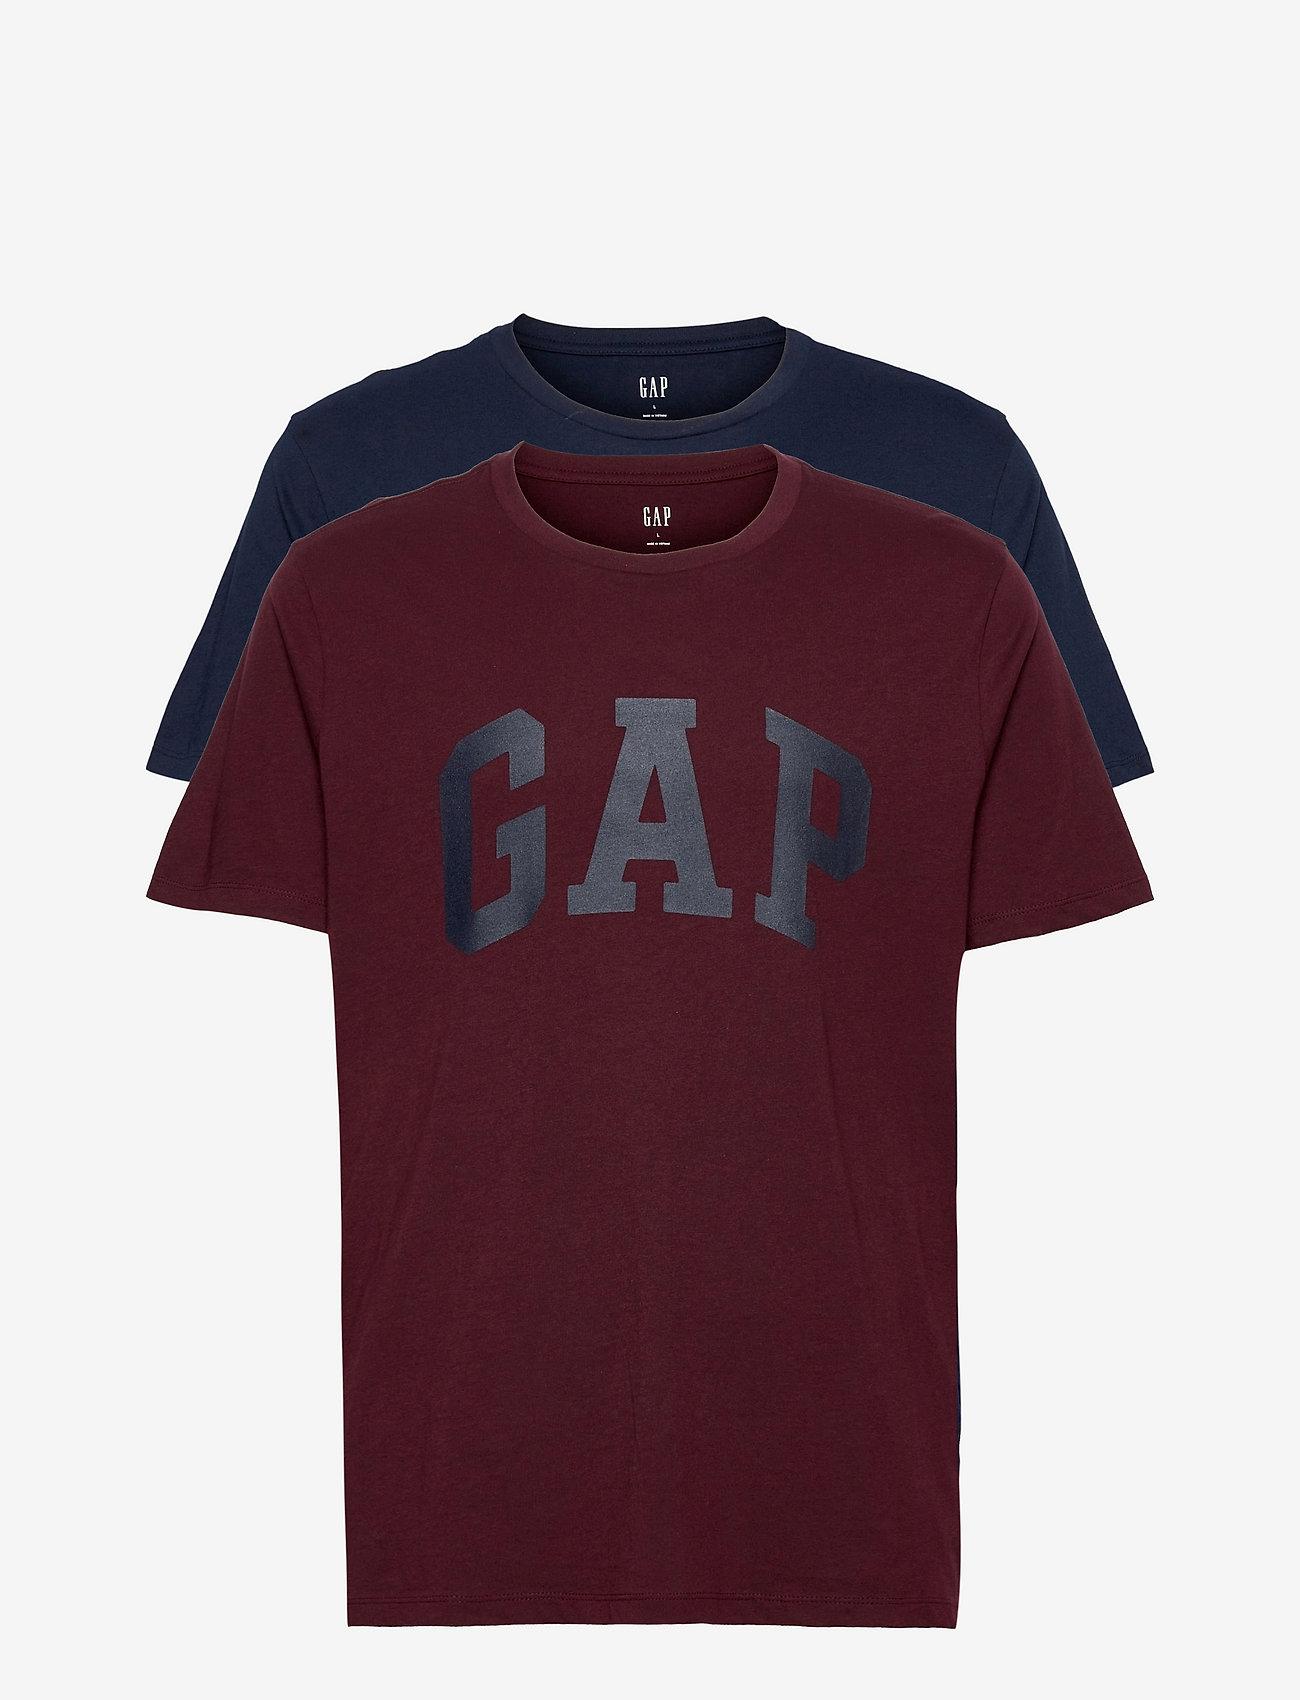 GAP - V-BASIC ARCH 2 PACK - t-shirts à manches courtes - multi - 0